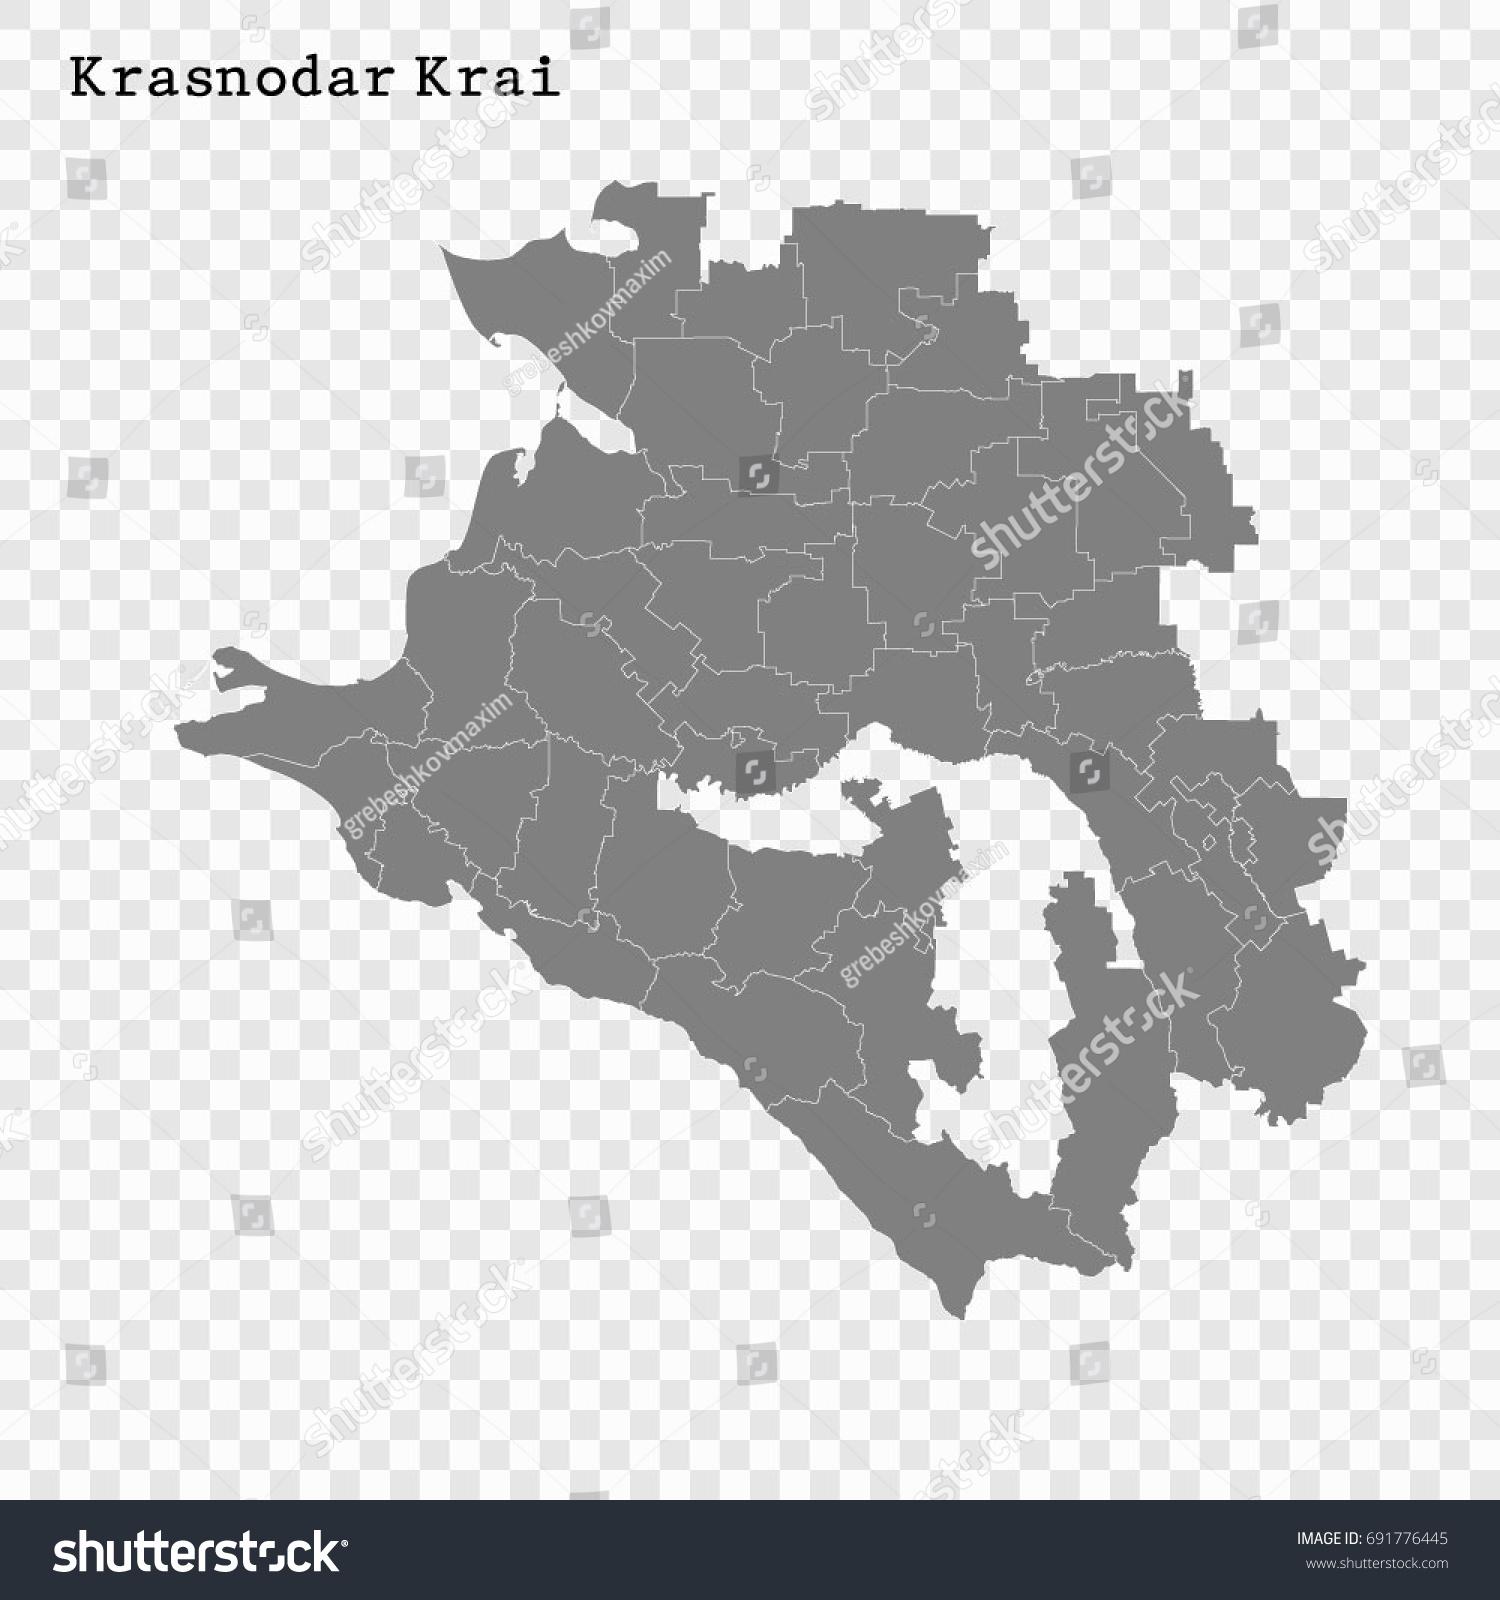 High Quality Map Krasnodar Krai Region Stock Vector 691776445